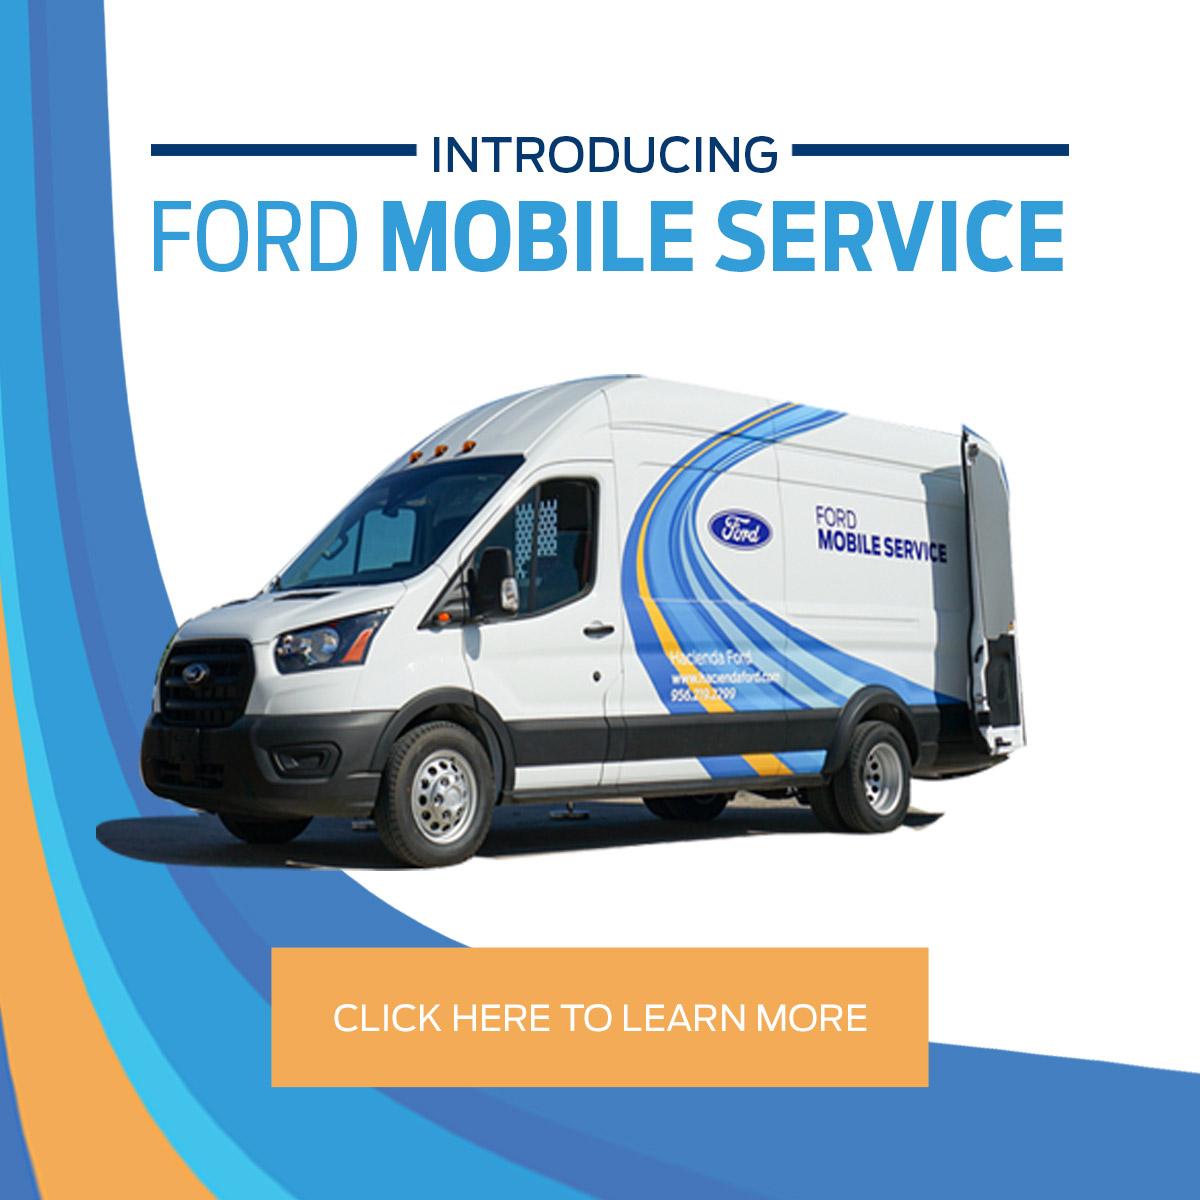 Mobile Service Tile